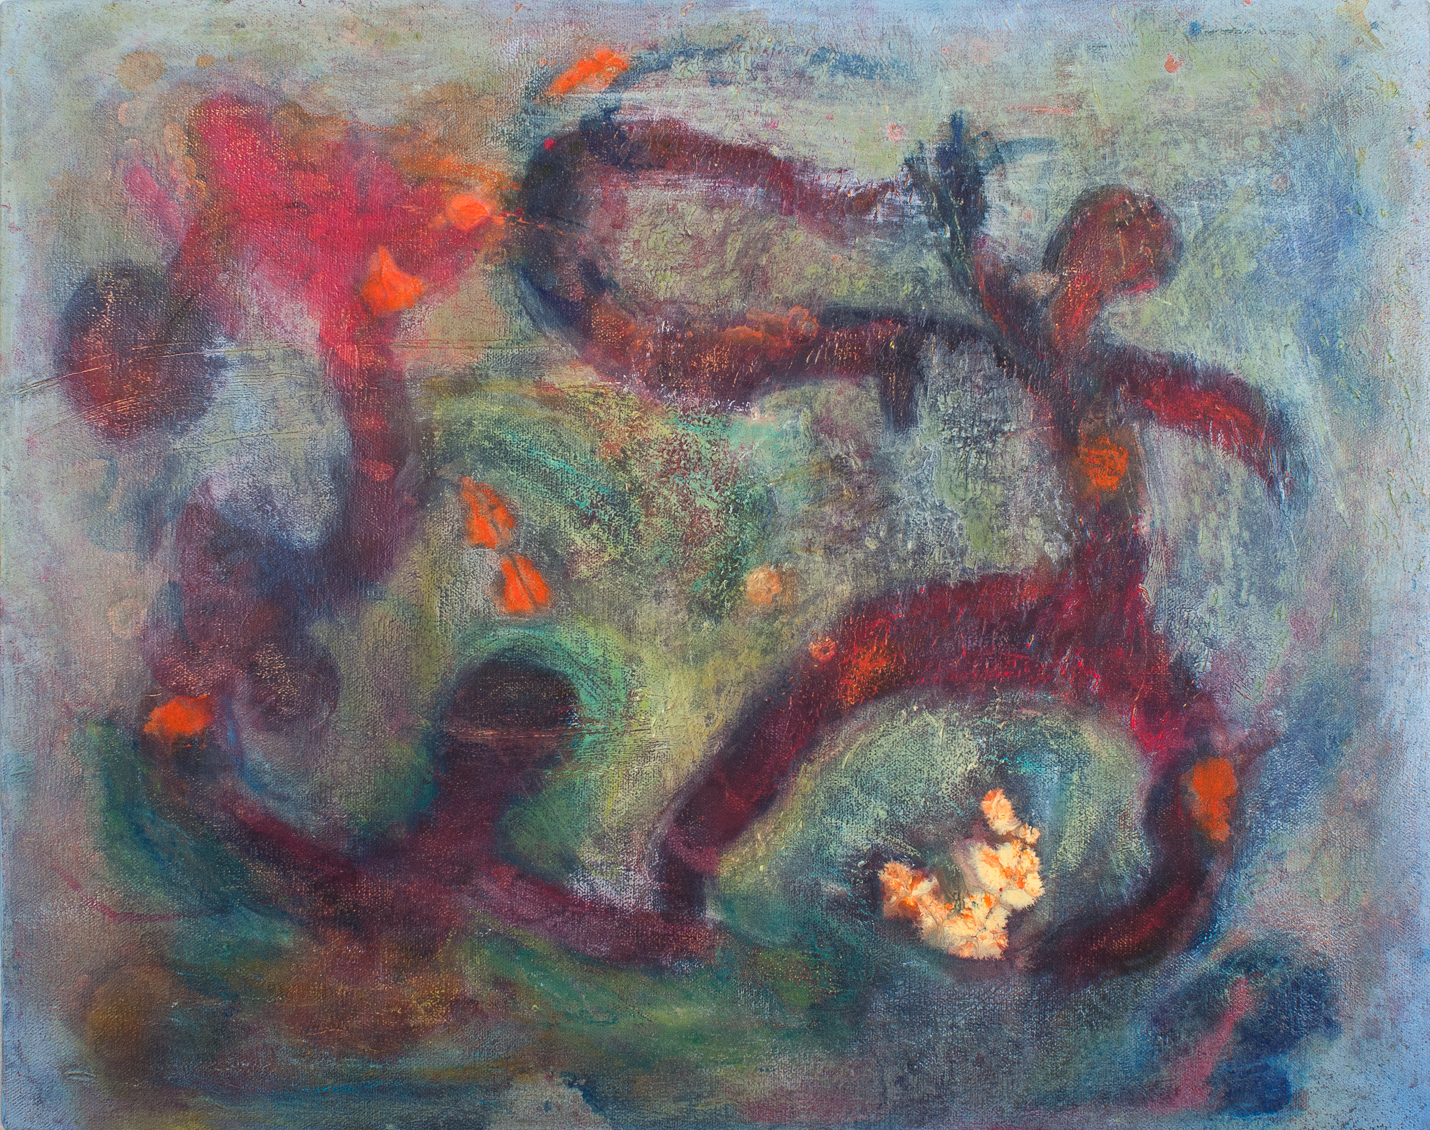 Art contemporain artiste peintre photographe for Art contemporain artistes